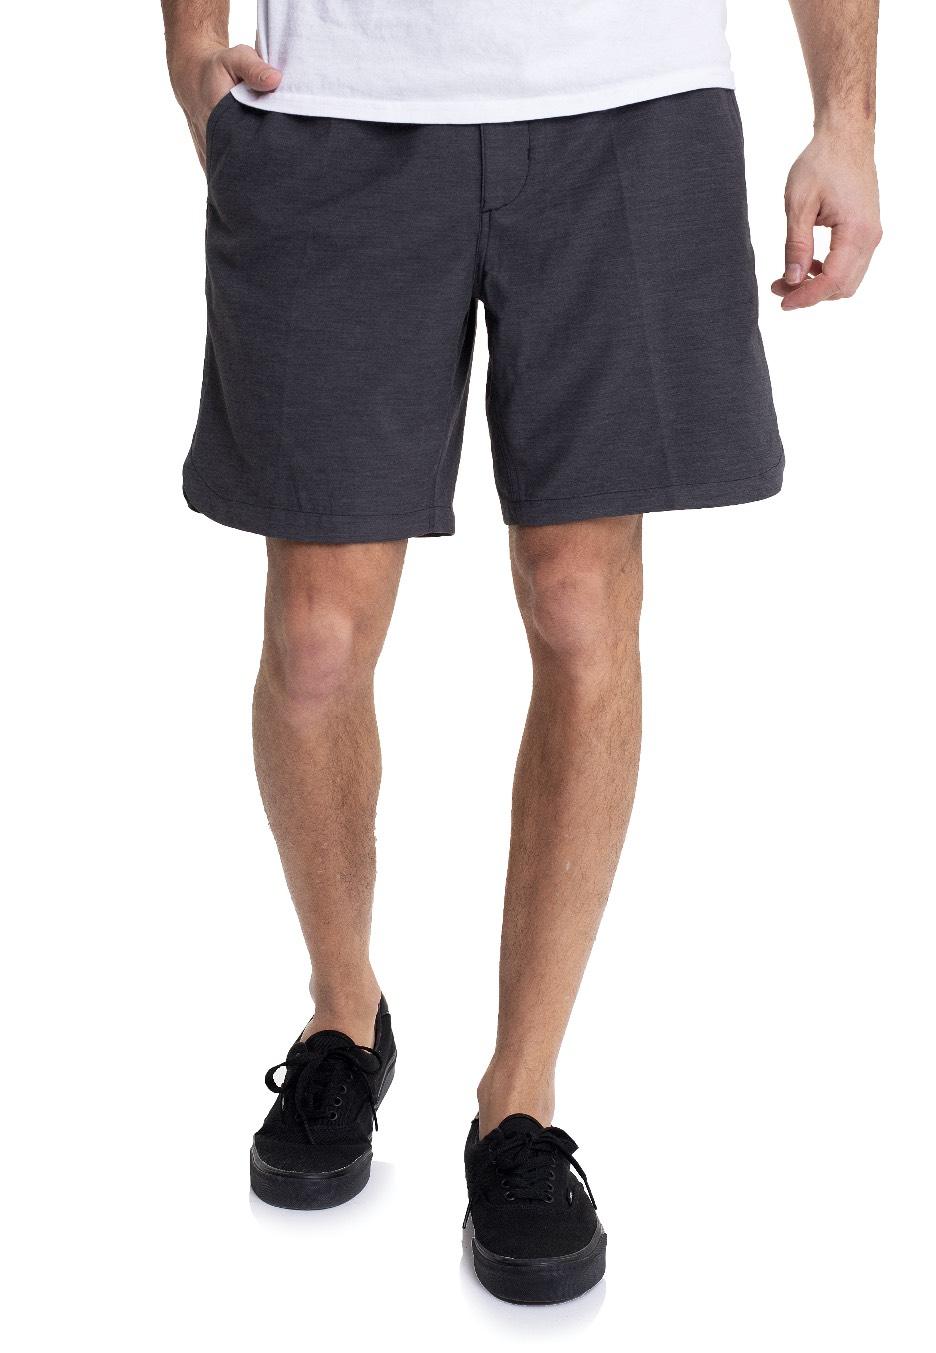 Vans - Microplush Hybrid Black - Shorts - Impericon.com US